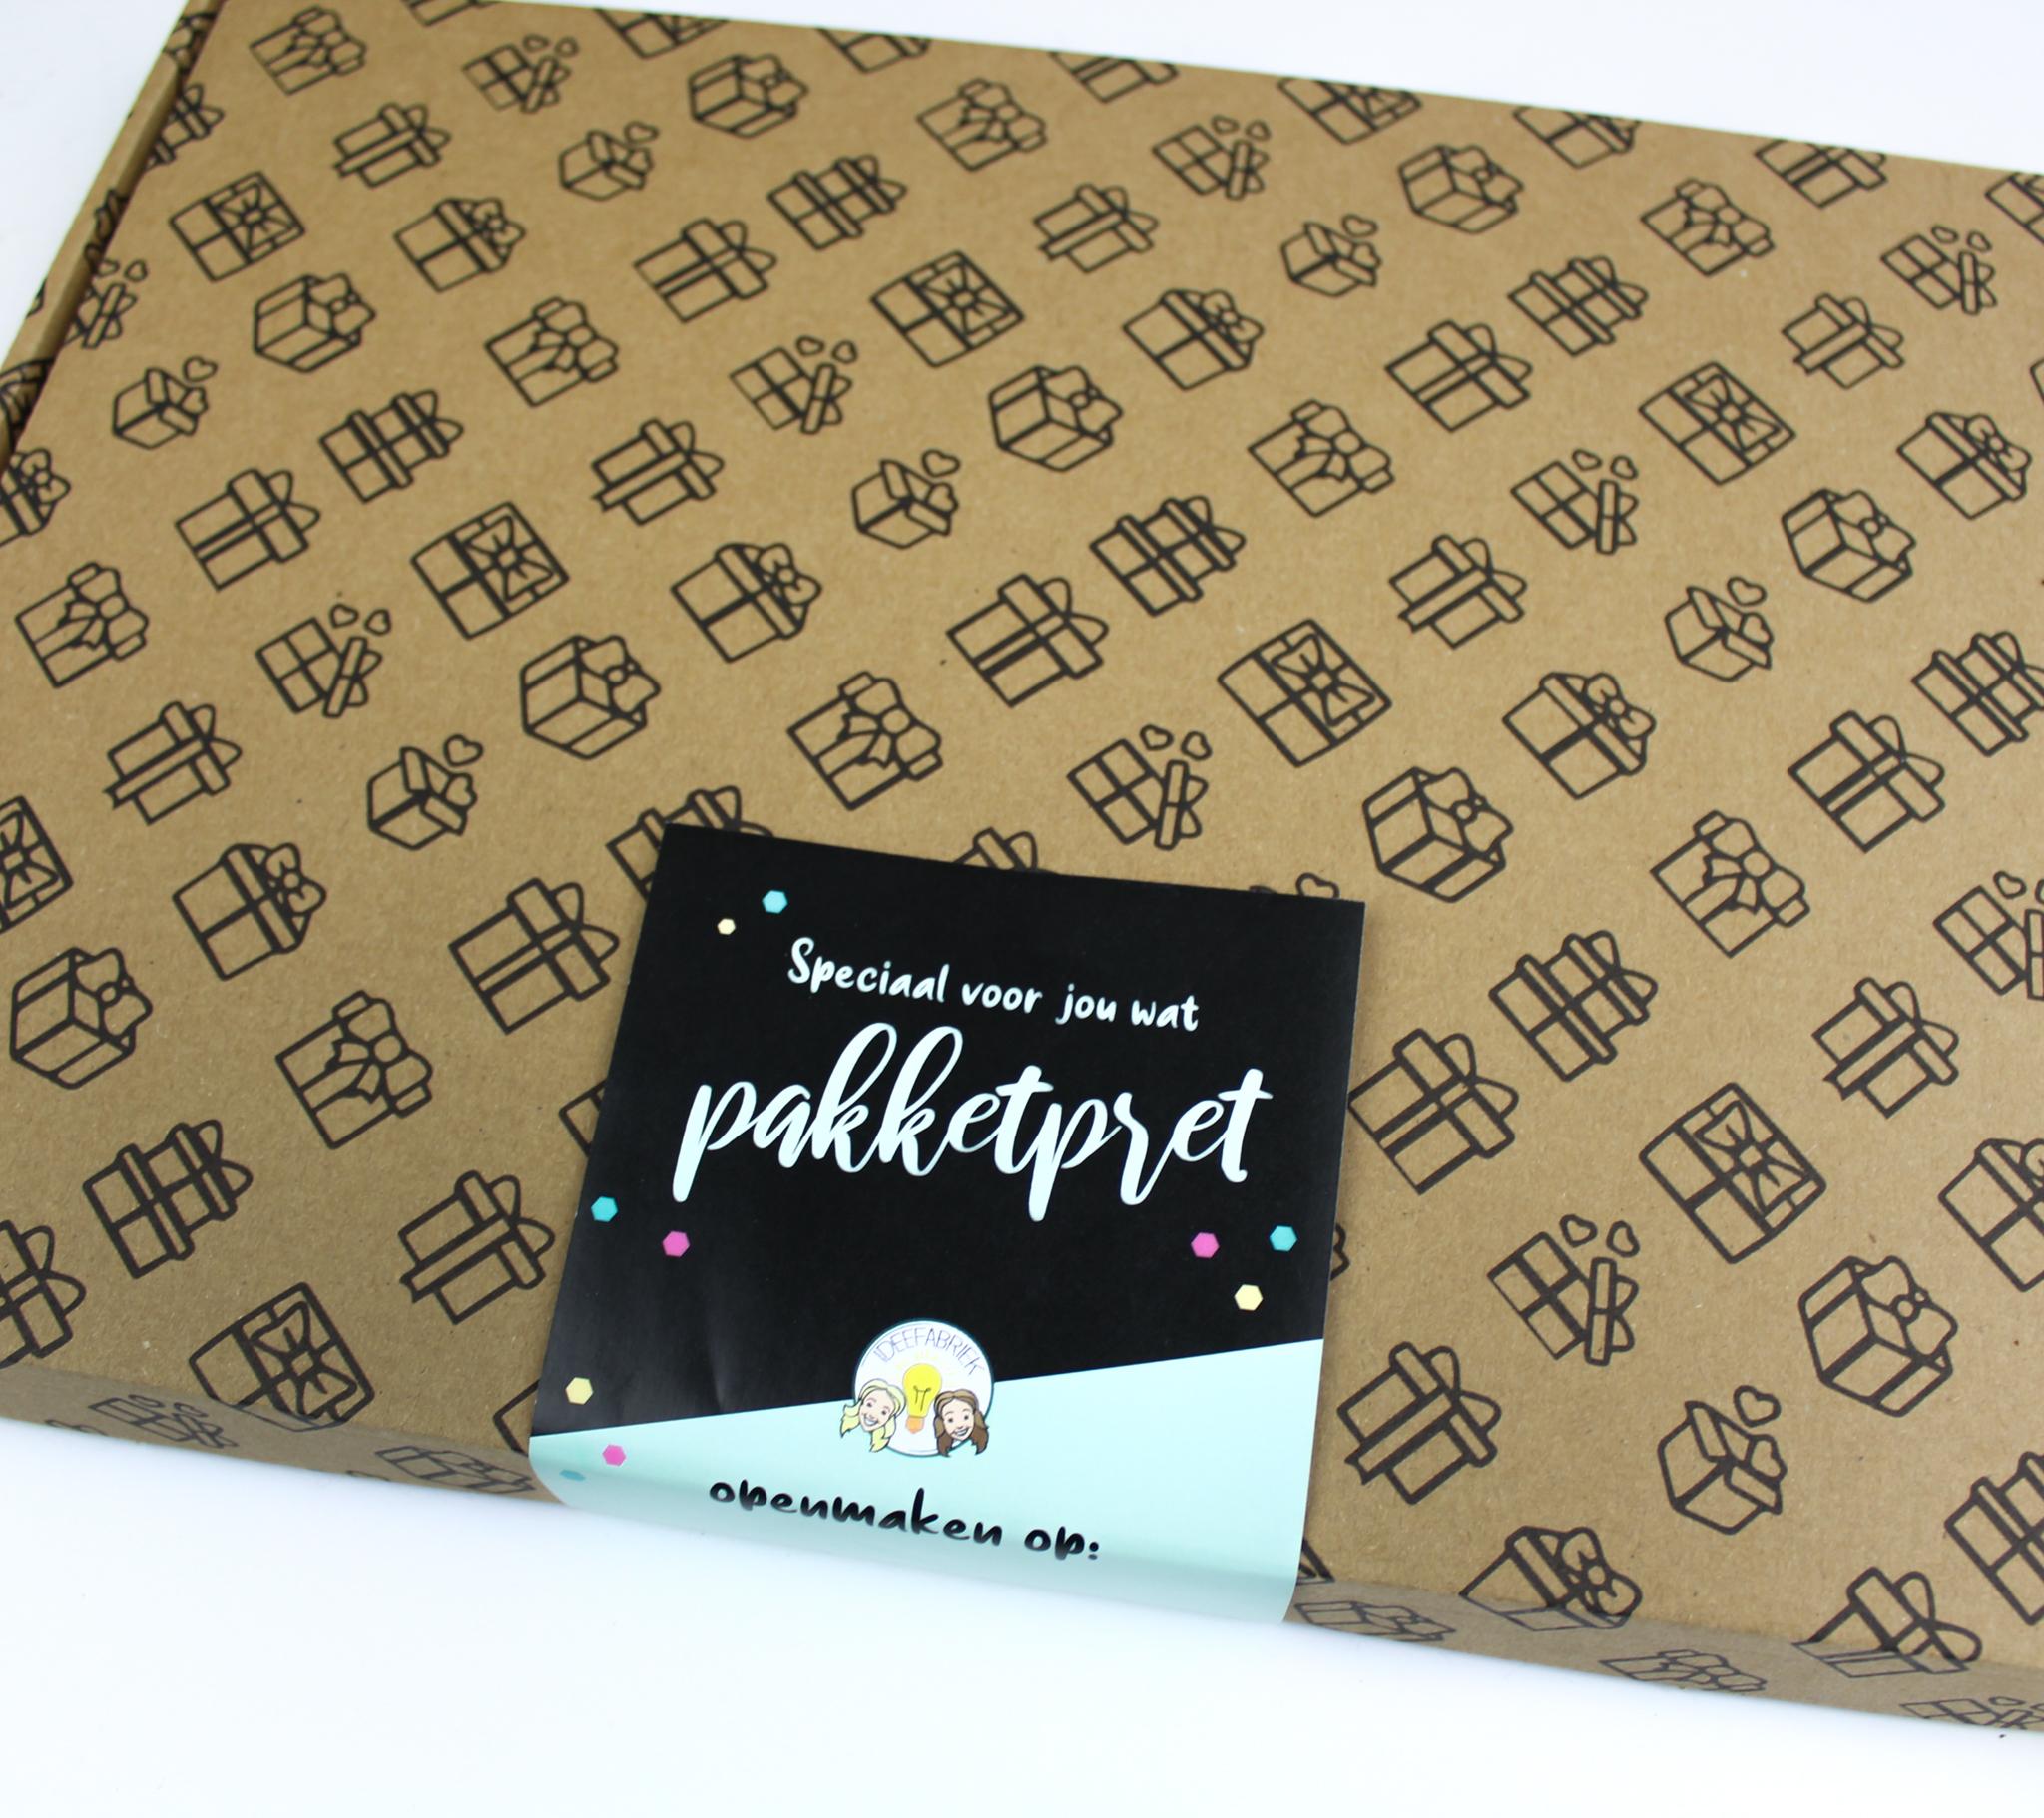 cadeaupakket cadeaupakketten ideefabriek brievenbuspakket